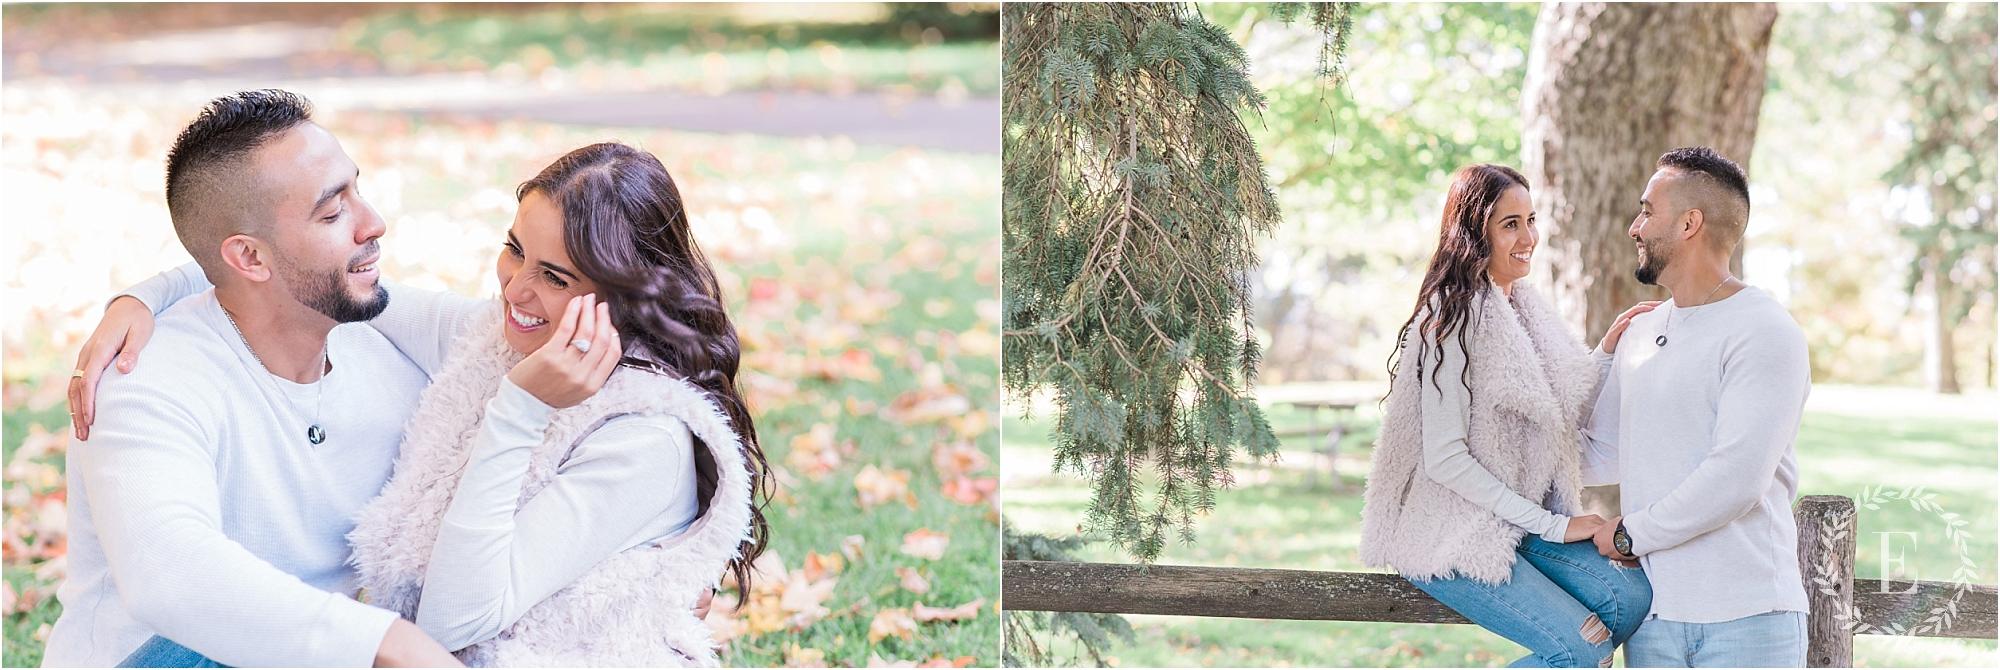 ottawa, fall, mini sessions, fall photos, ottawa in the fall, claudette Cain park